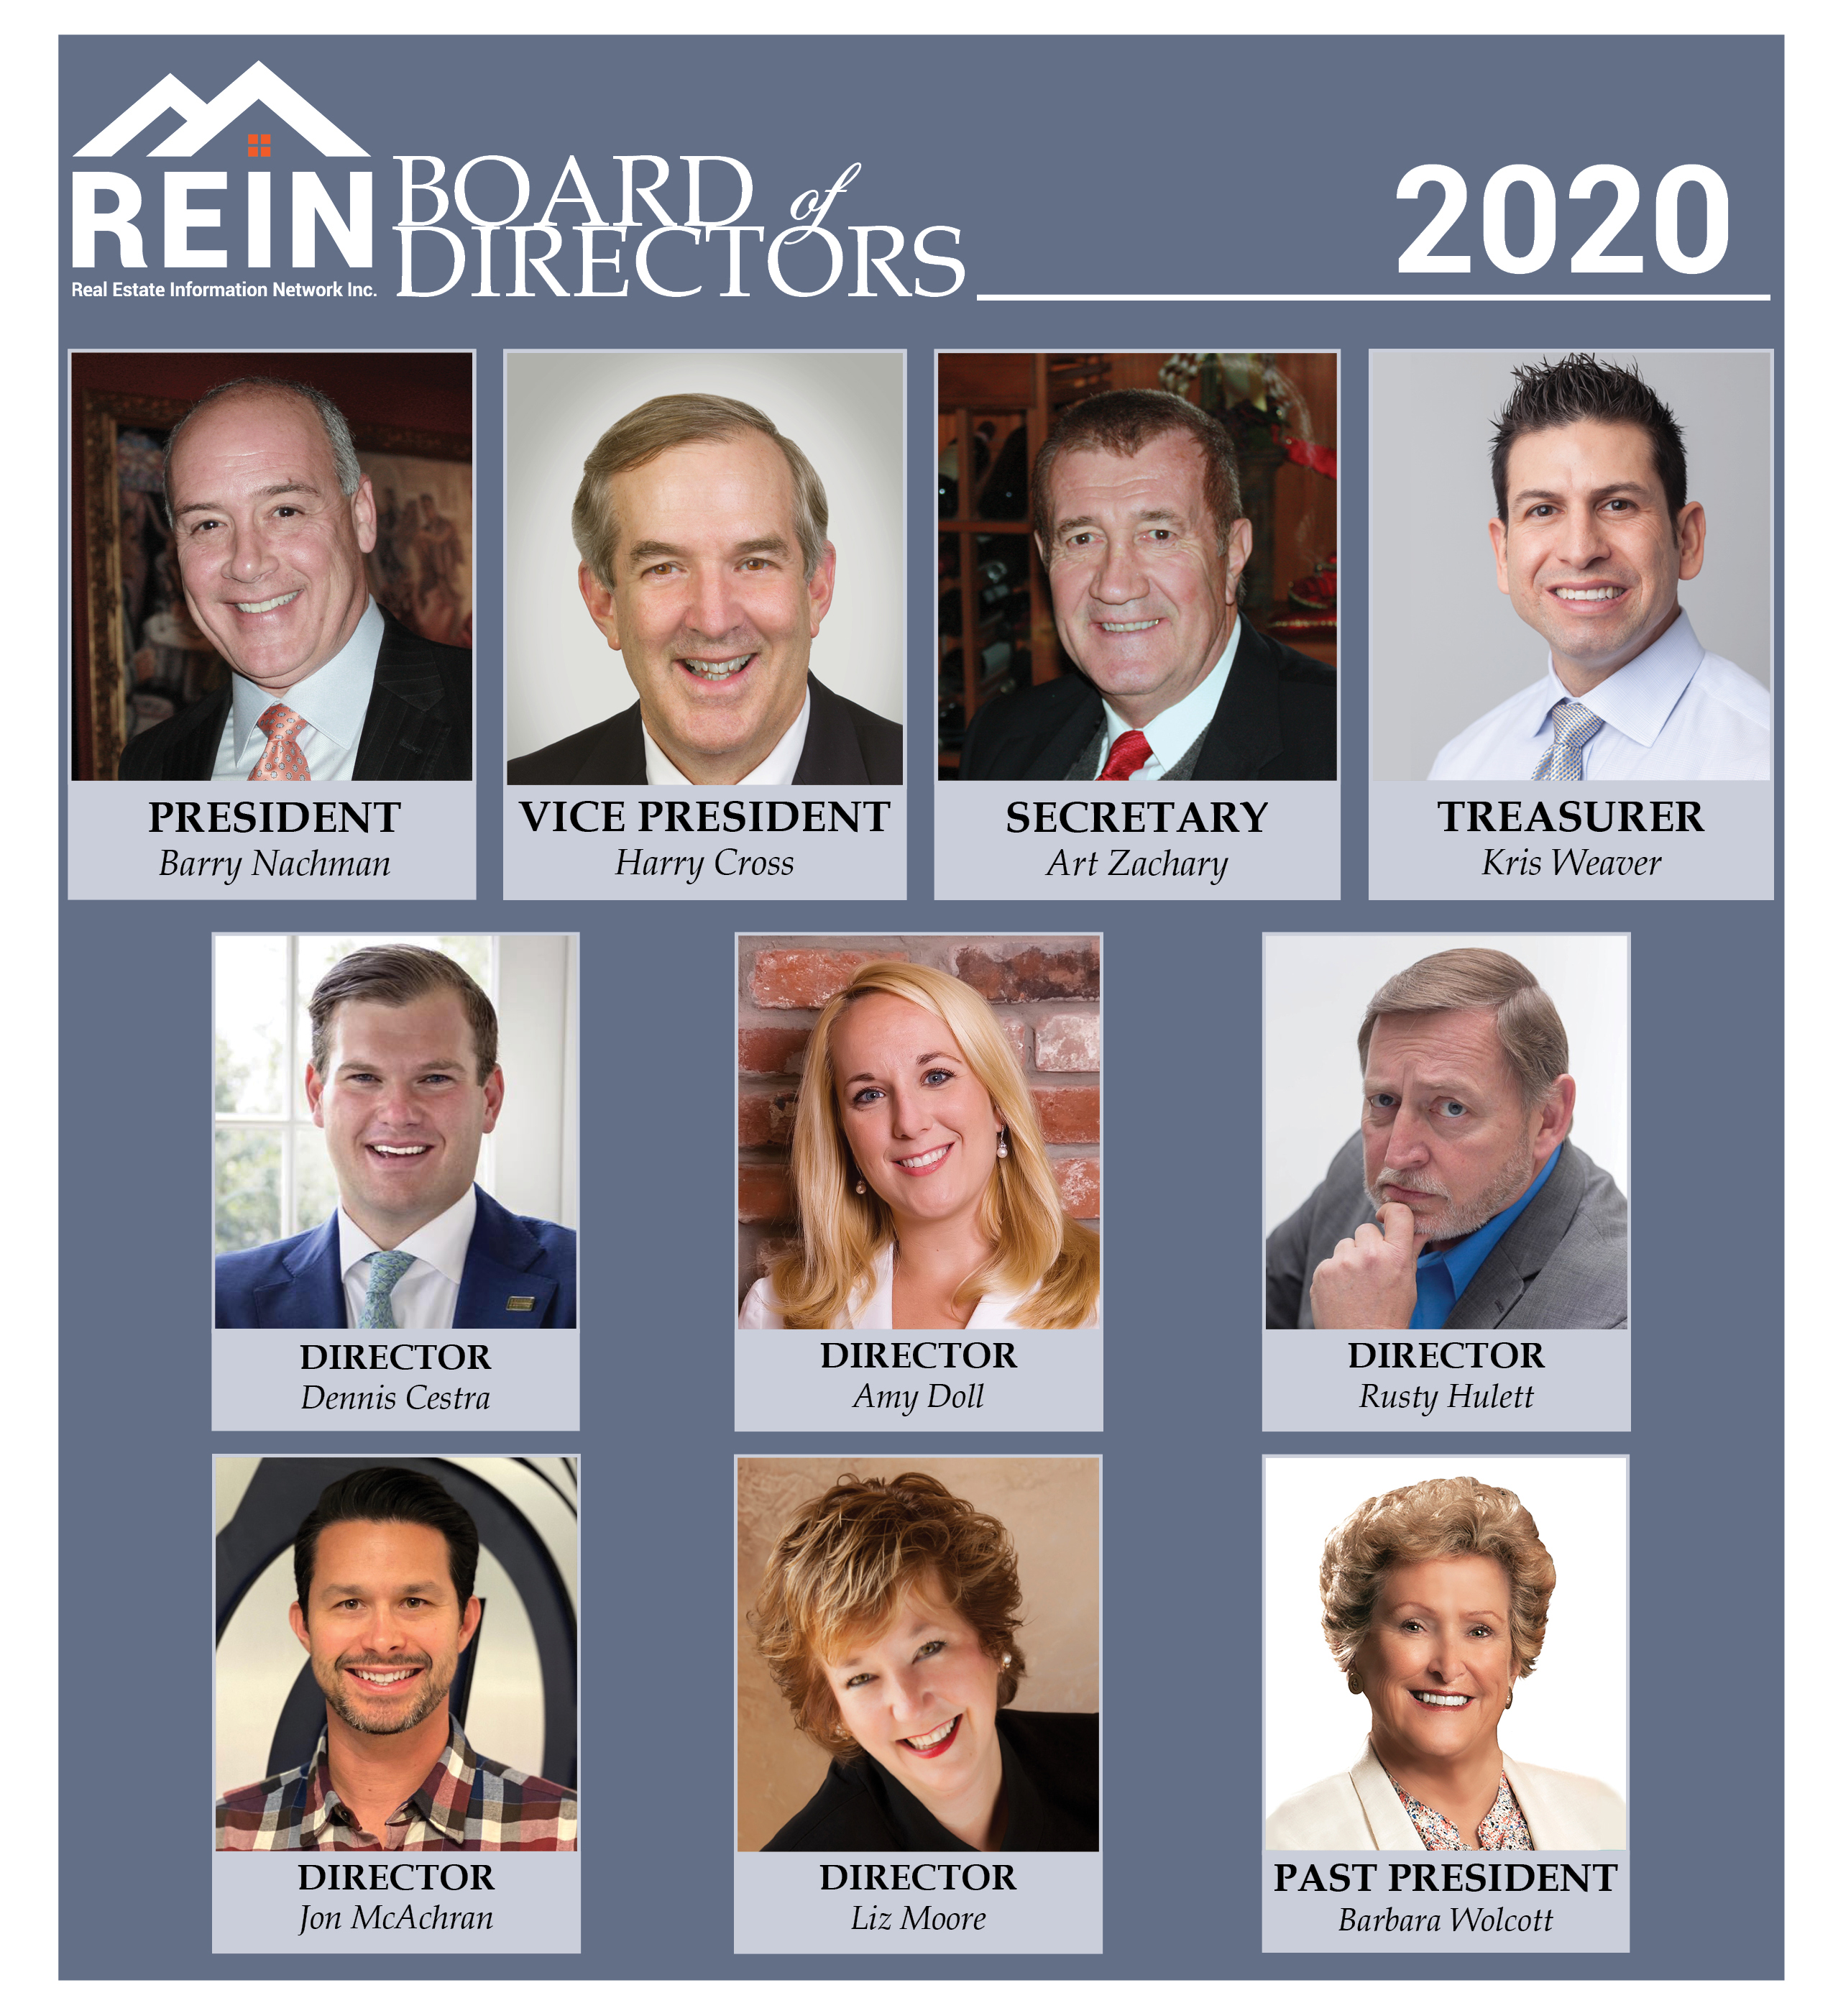 image of rein's 2020 board of directors